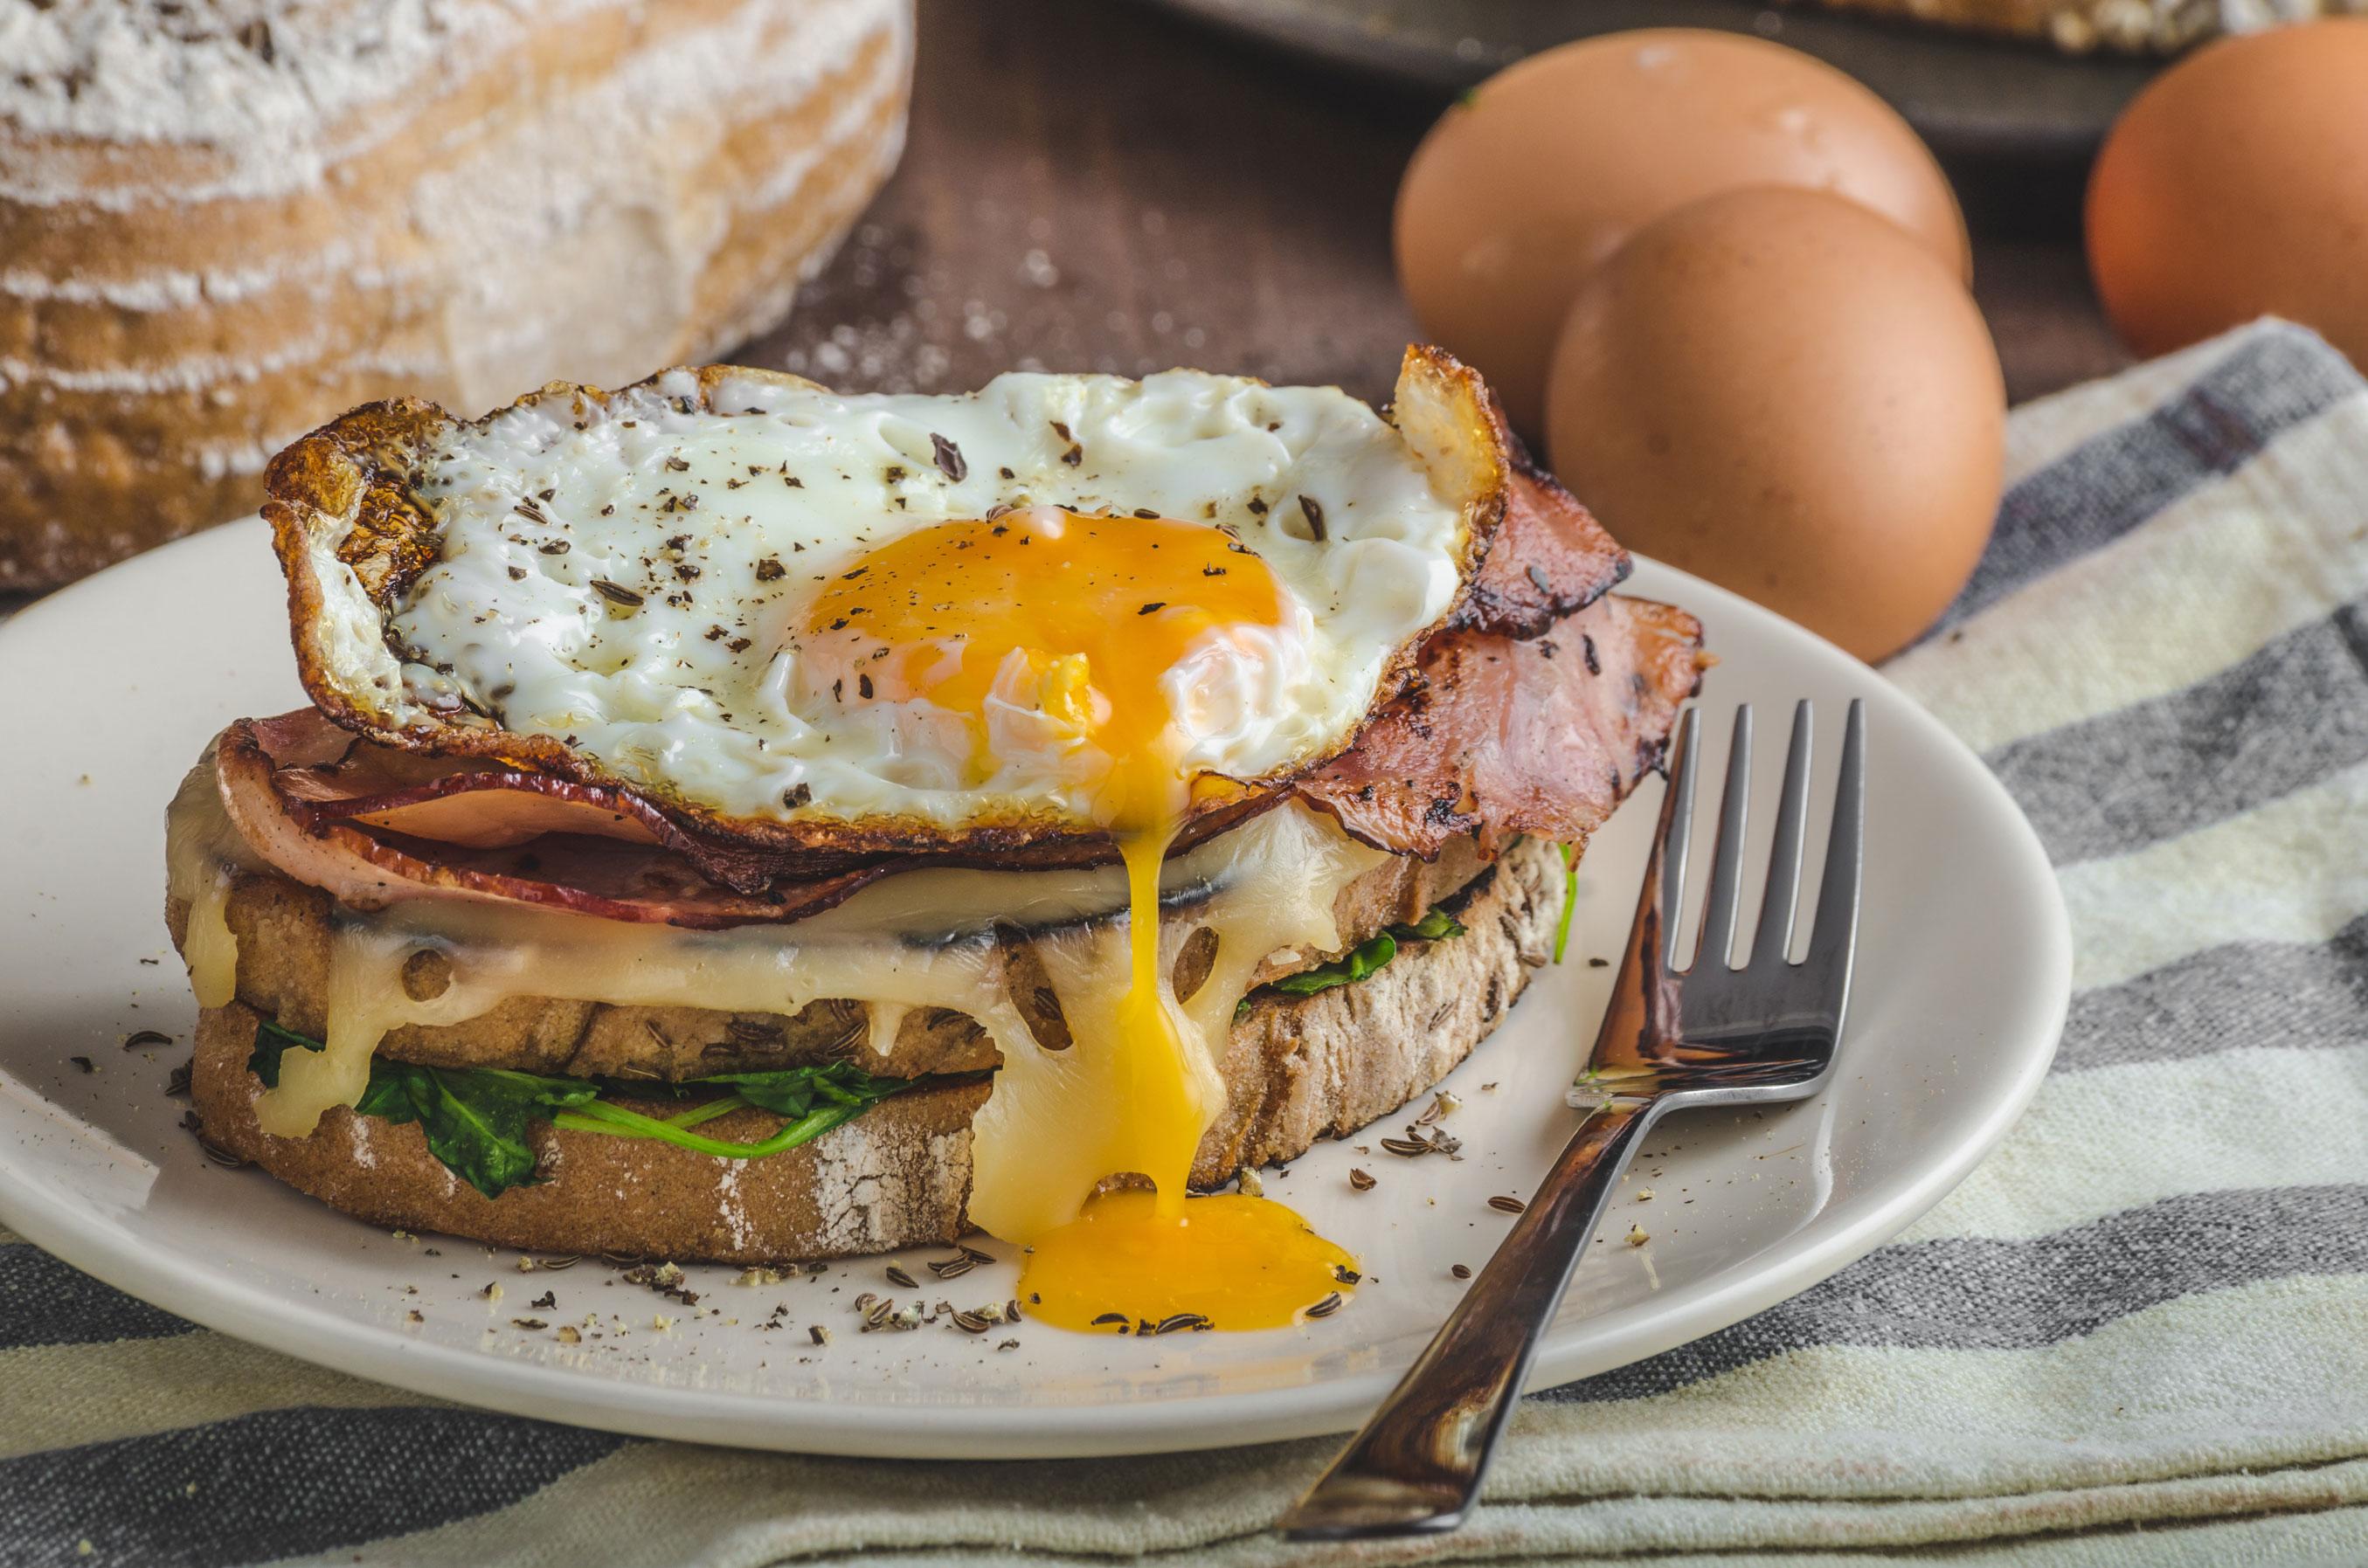 Making Croque Monsieur: The Classic Bistro Sandwich